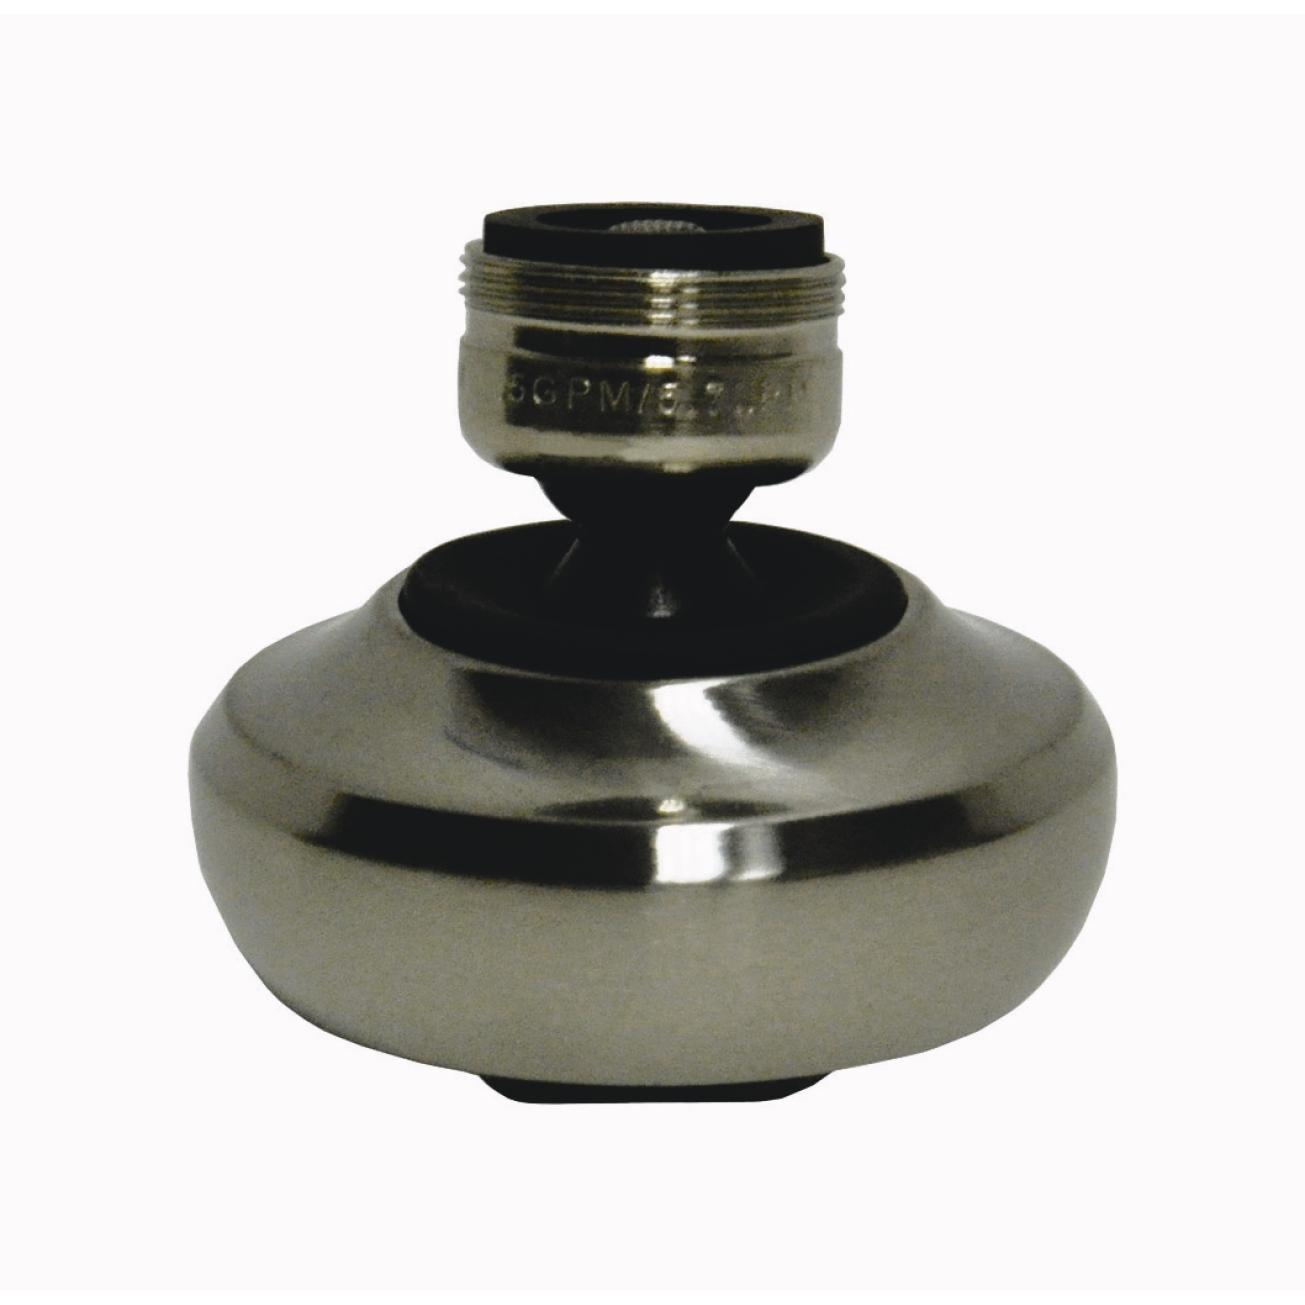 Ideas, swivel aerators for faucets swivel aerators for faucets kitchen sink and faucet aerators at ace hardware 1305 x 1305  .